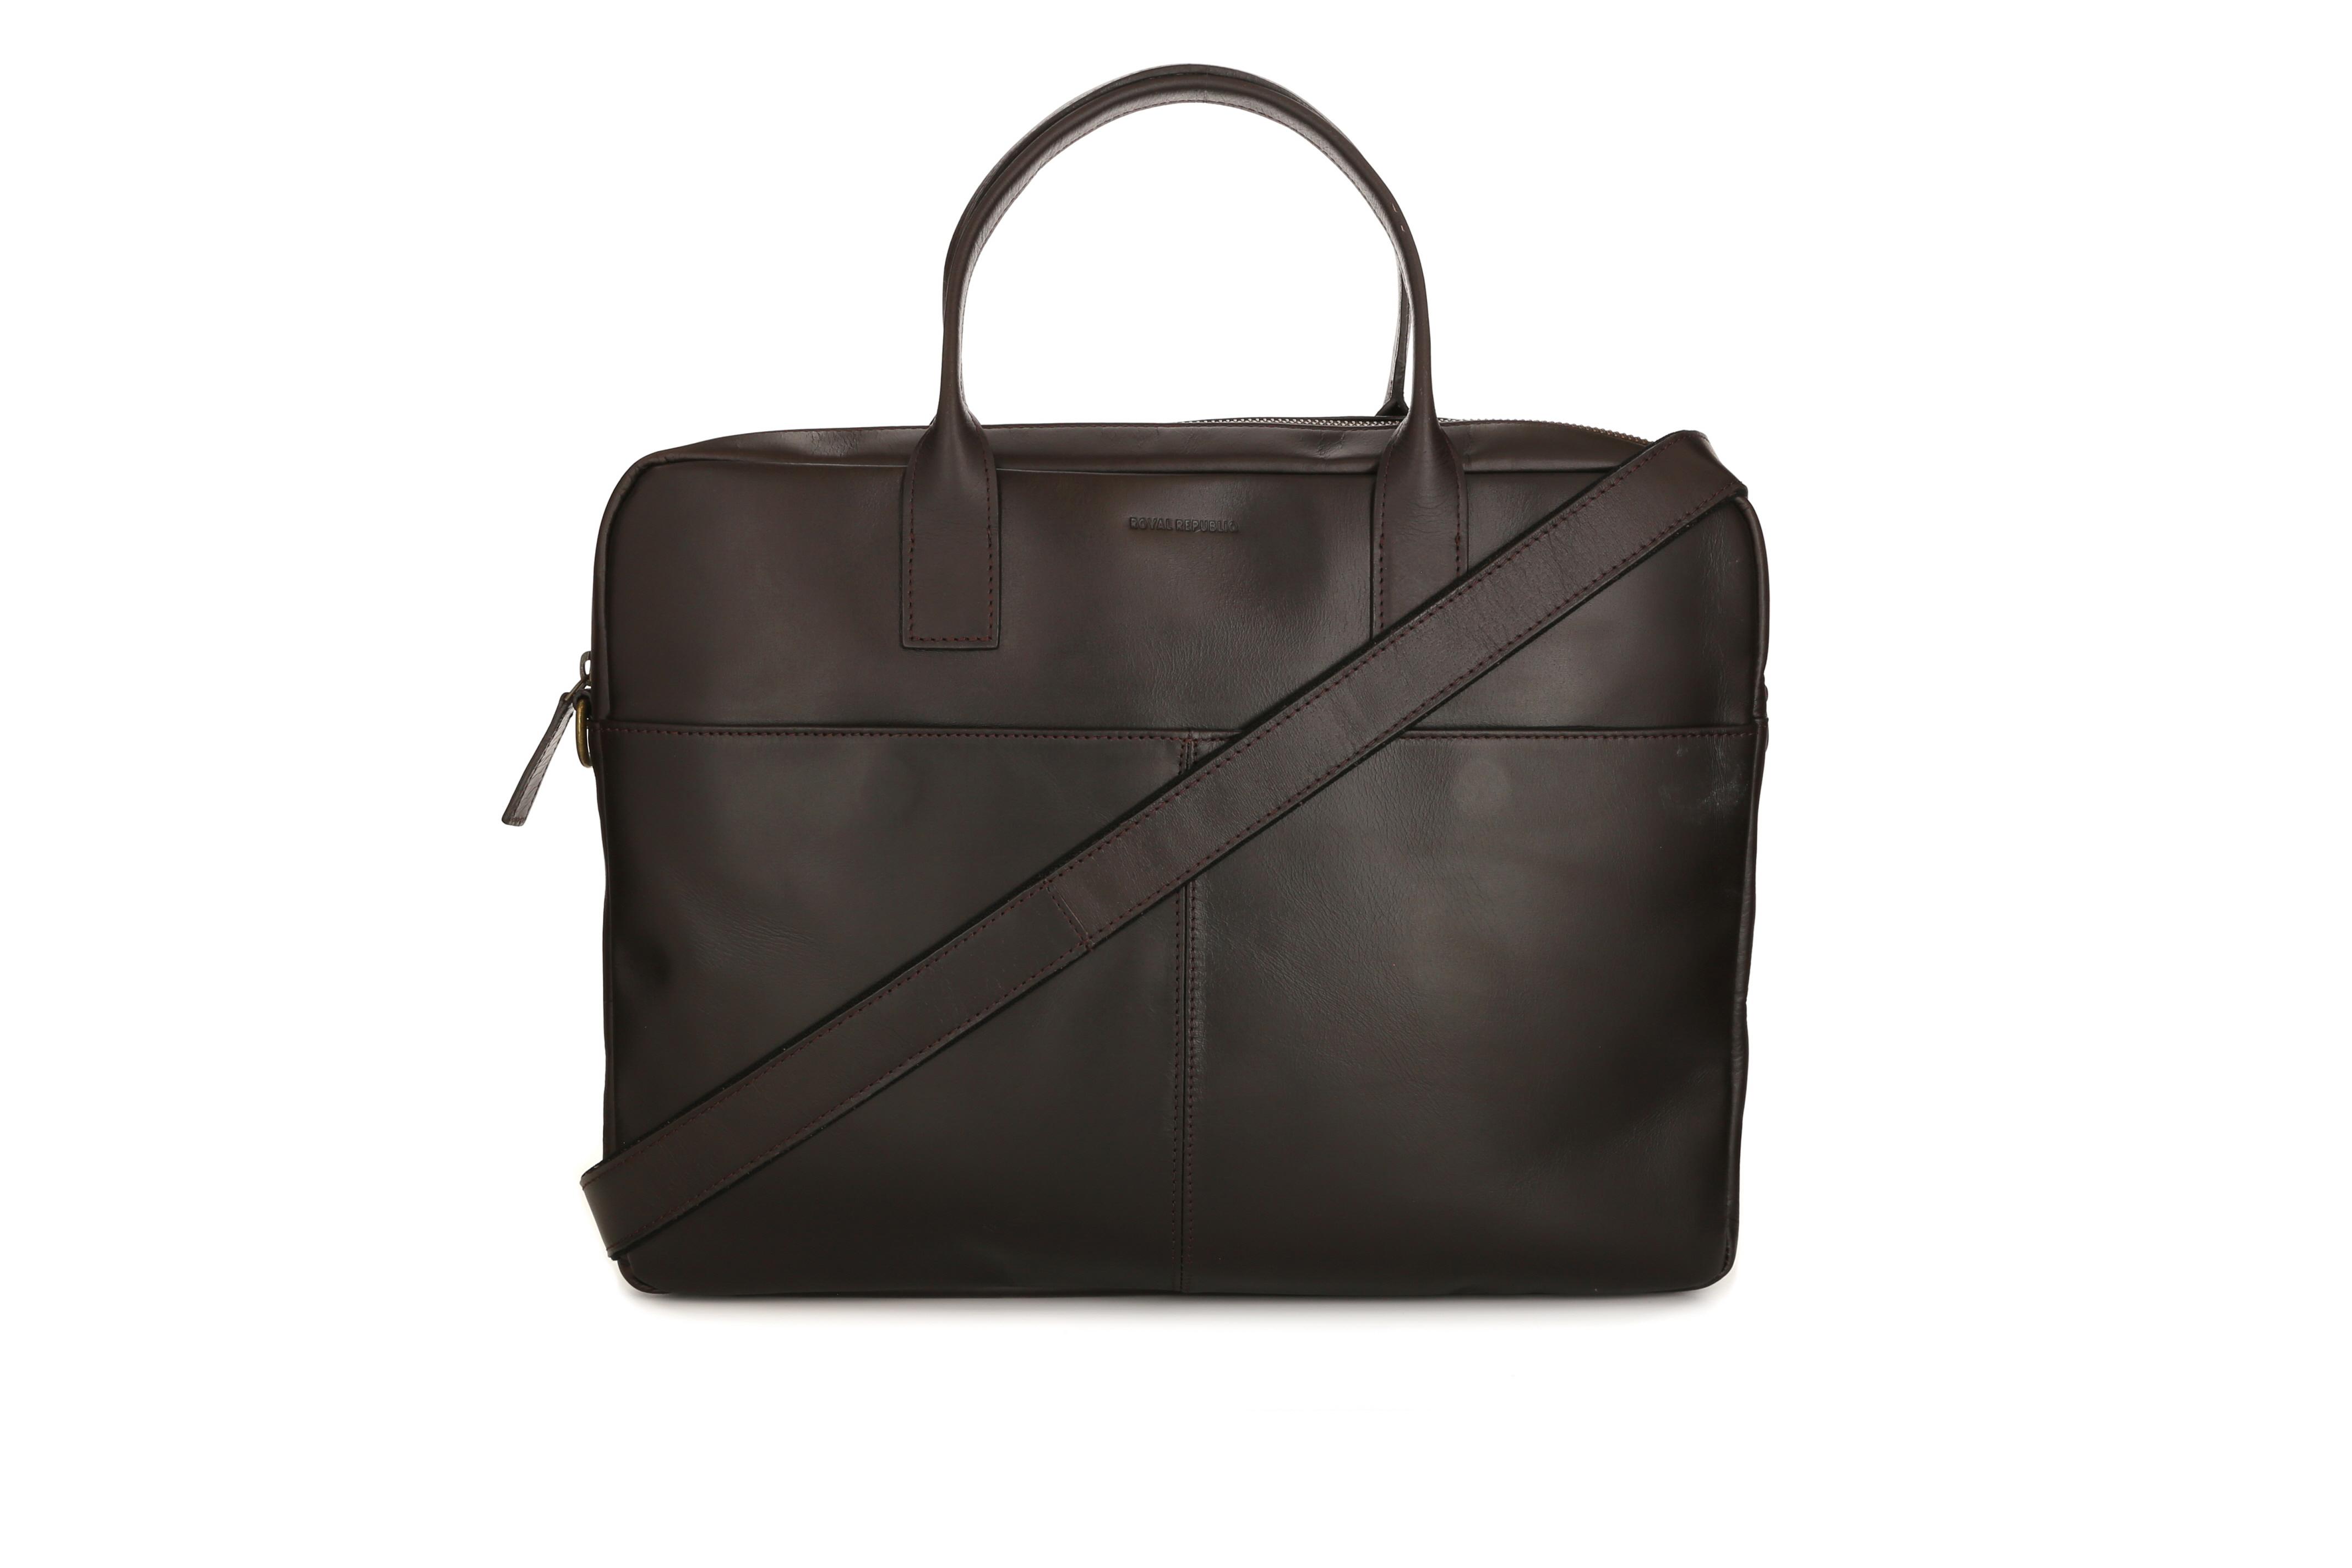 Väskor Herr  d7df4555e47df